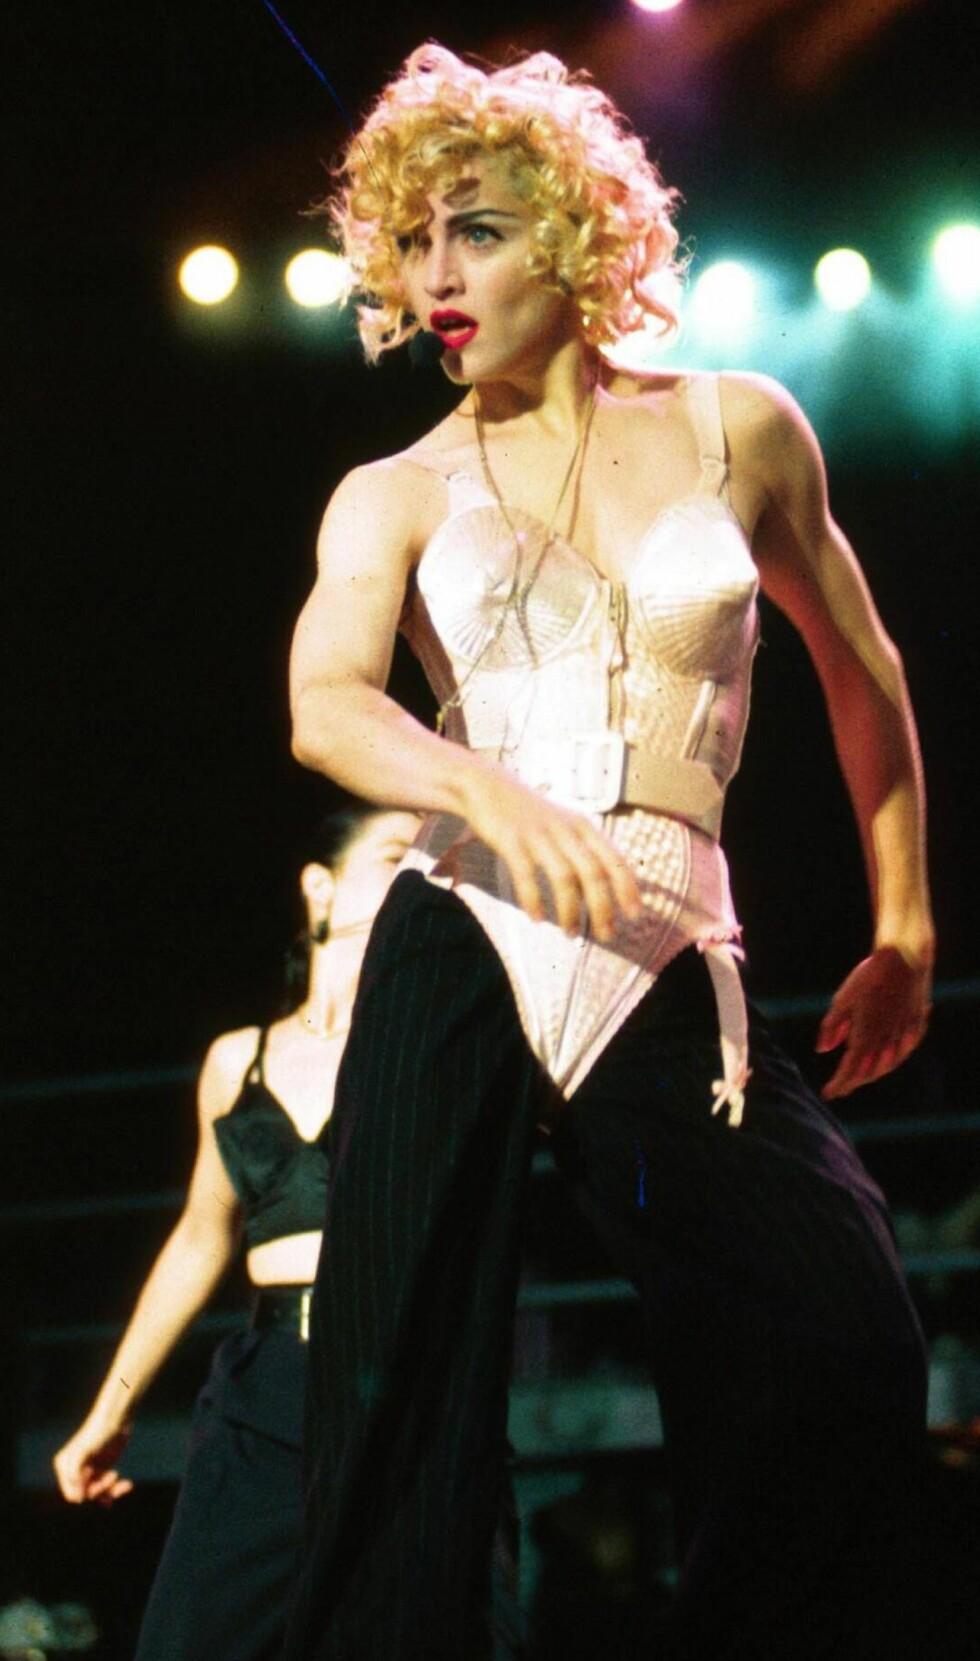 Korsettet Madonna bar under «Blond Ambition World Tour» er designet av Jean Paul Gaultier.